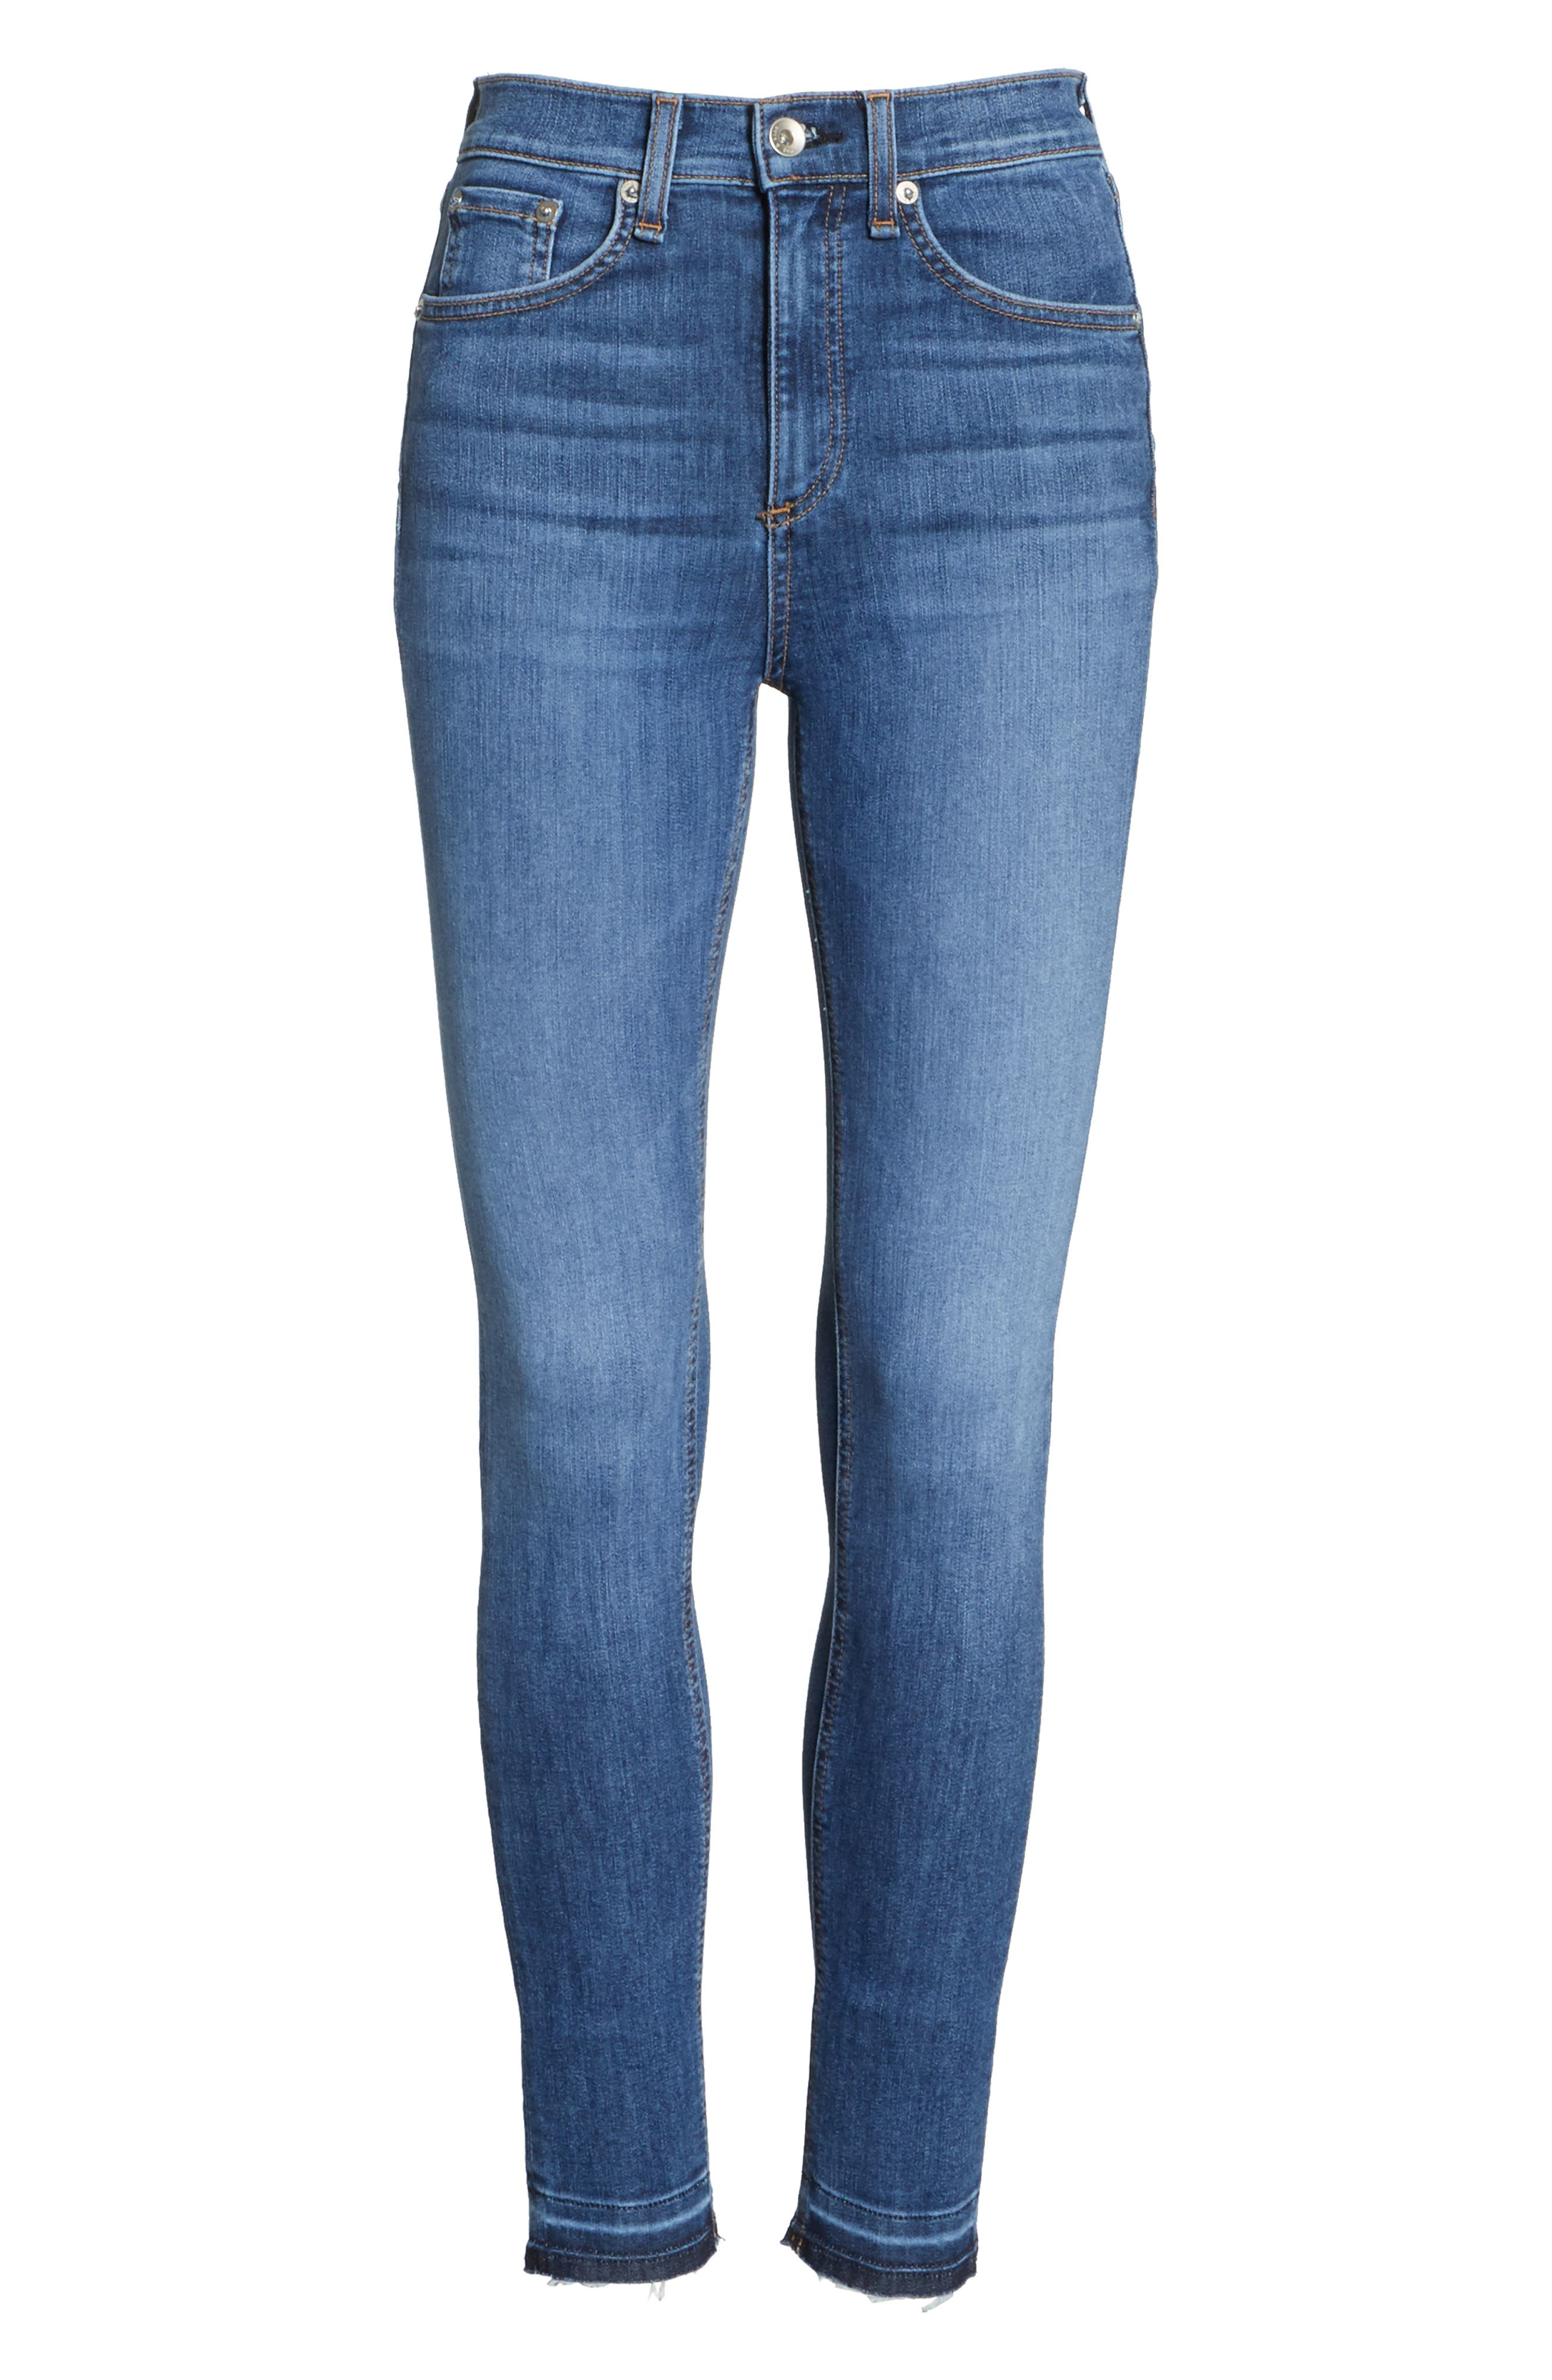 High Waist Ankle Skinny Jeans,                             Alternate thumbnail 7, color,                             426